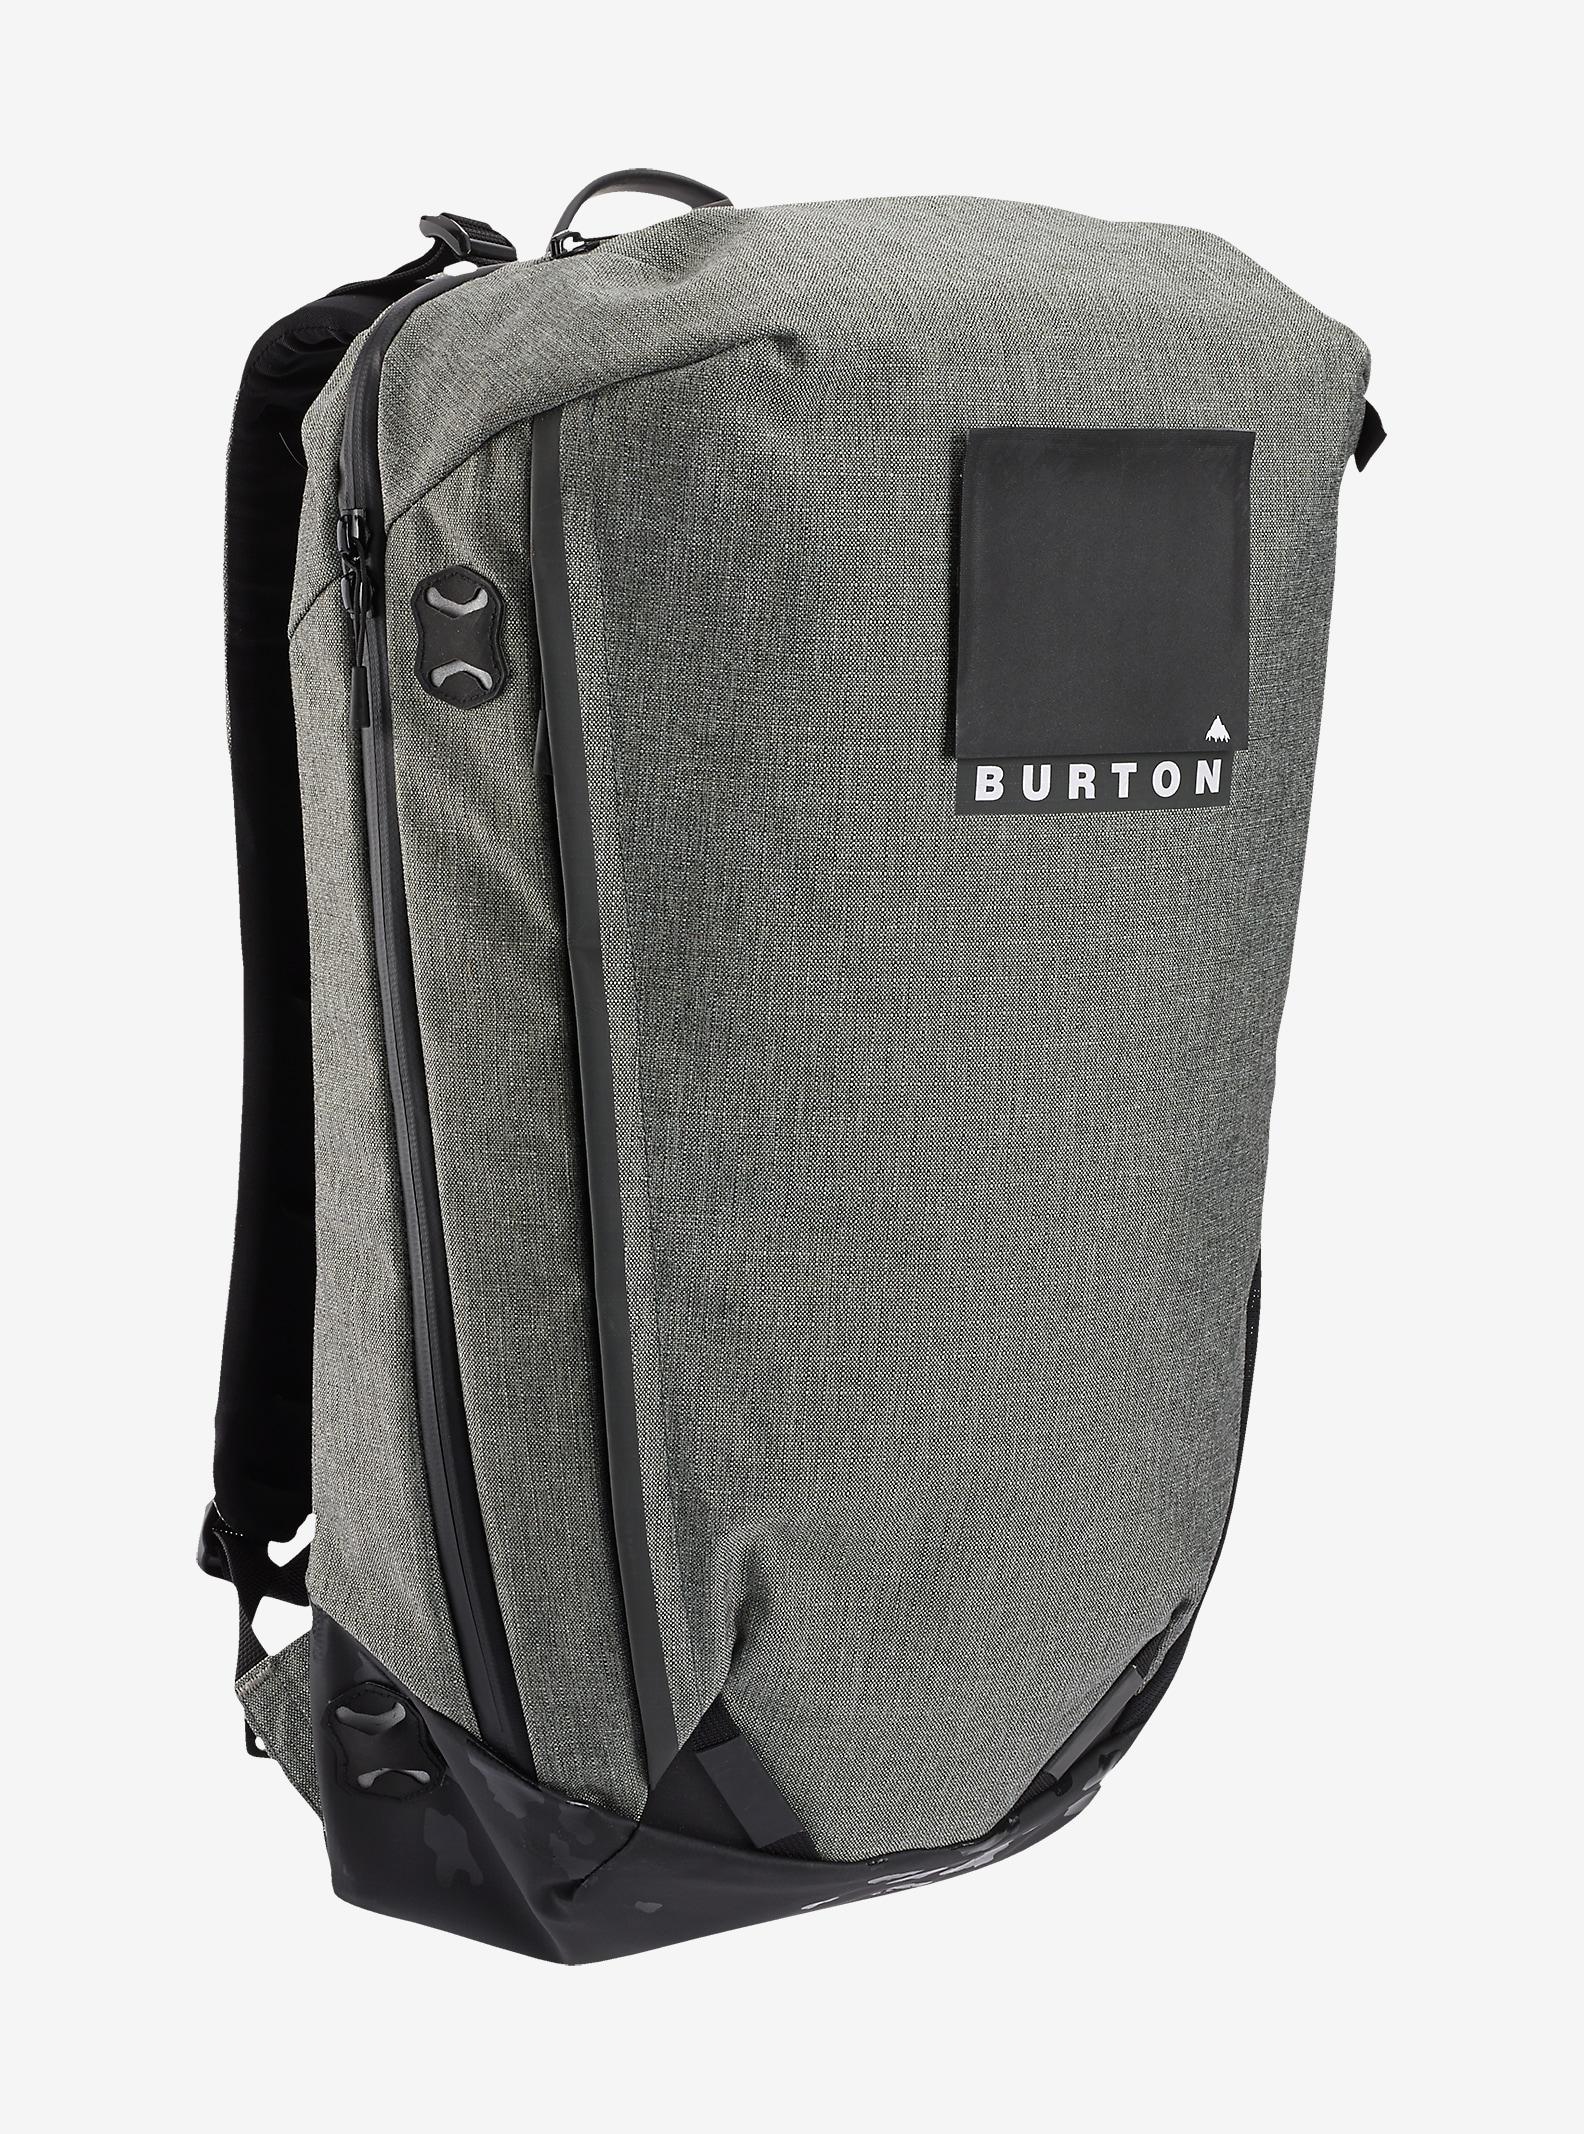 Burton Gorge Pack shown in Pelican Grey Cordura®